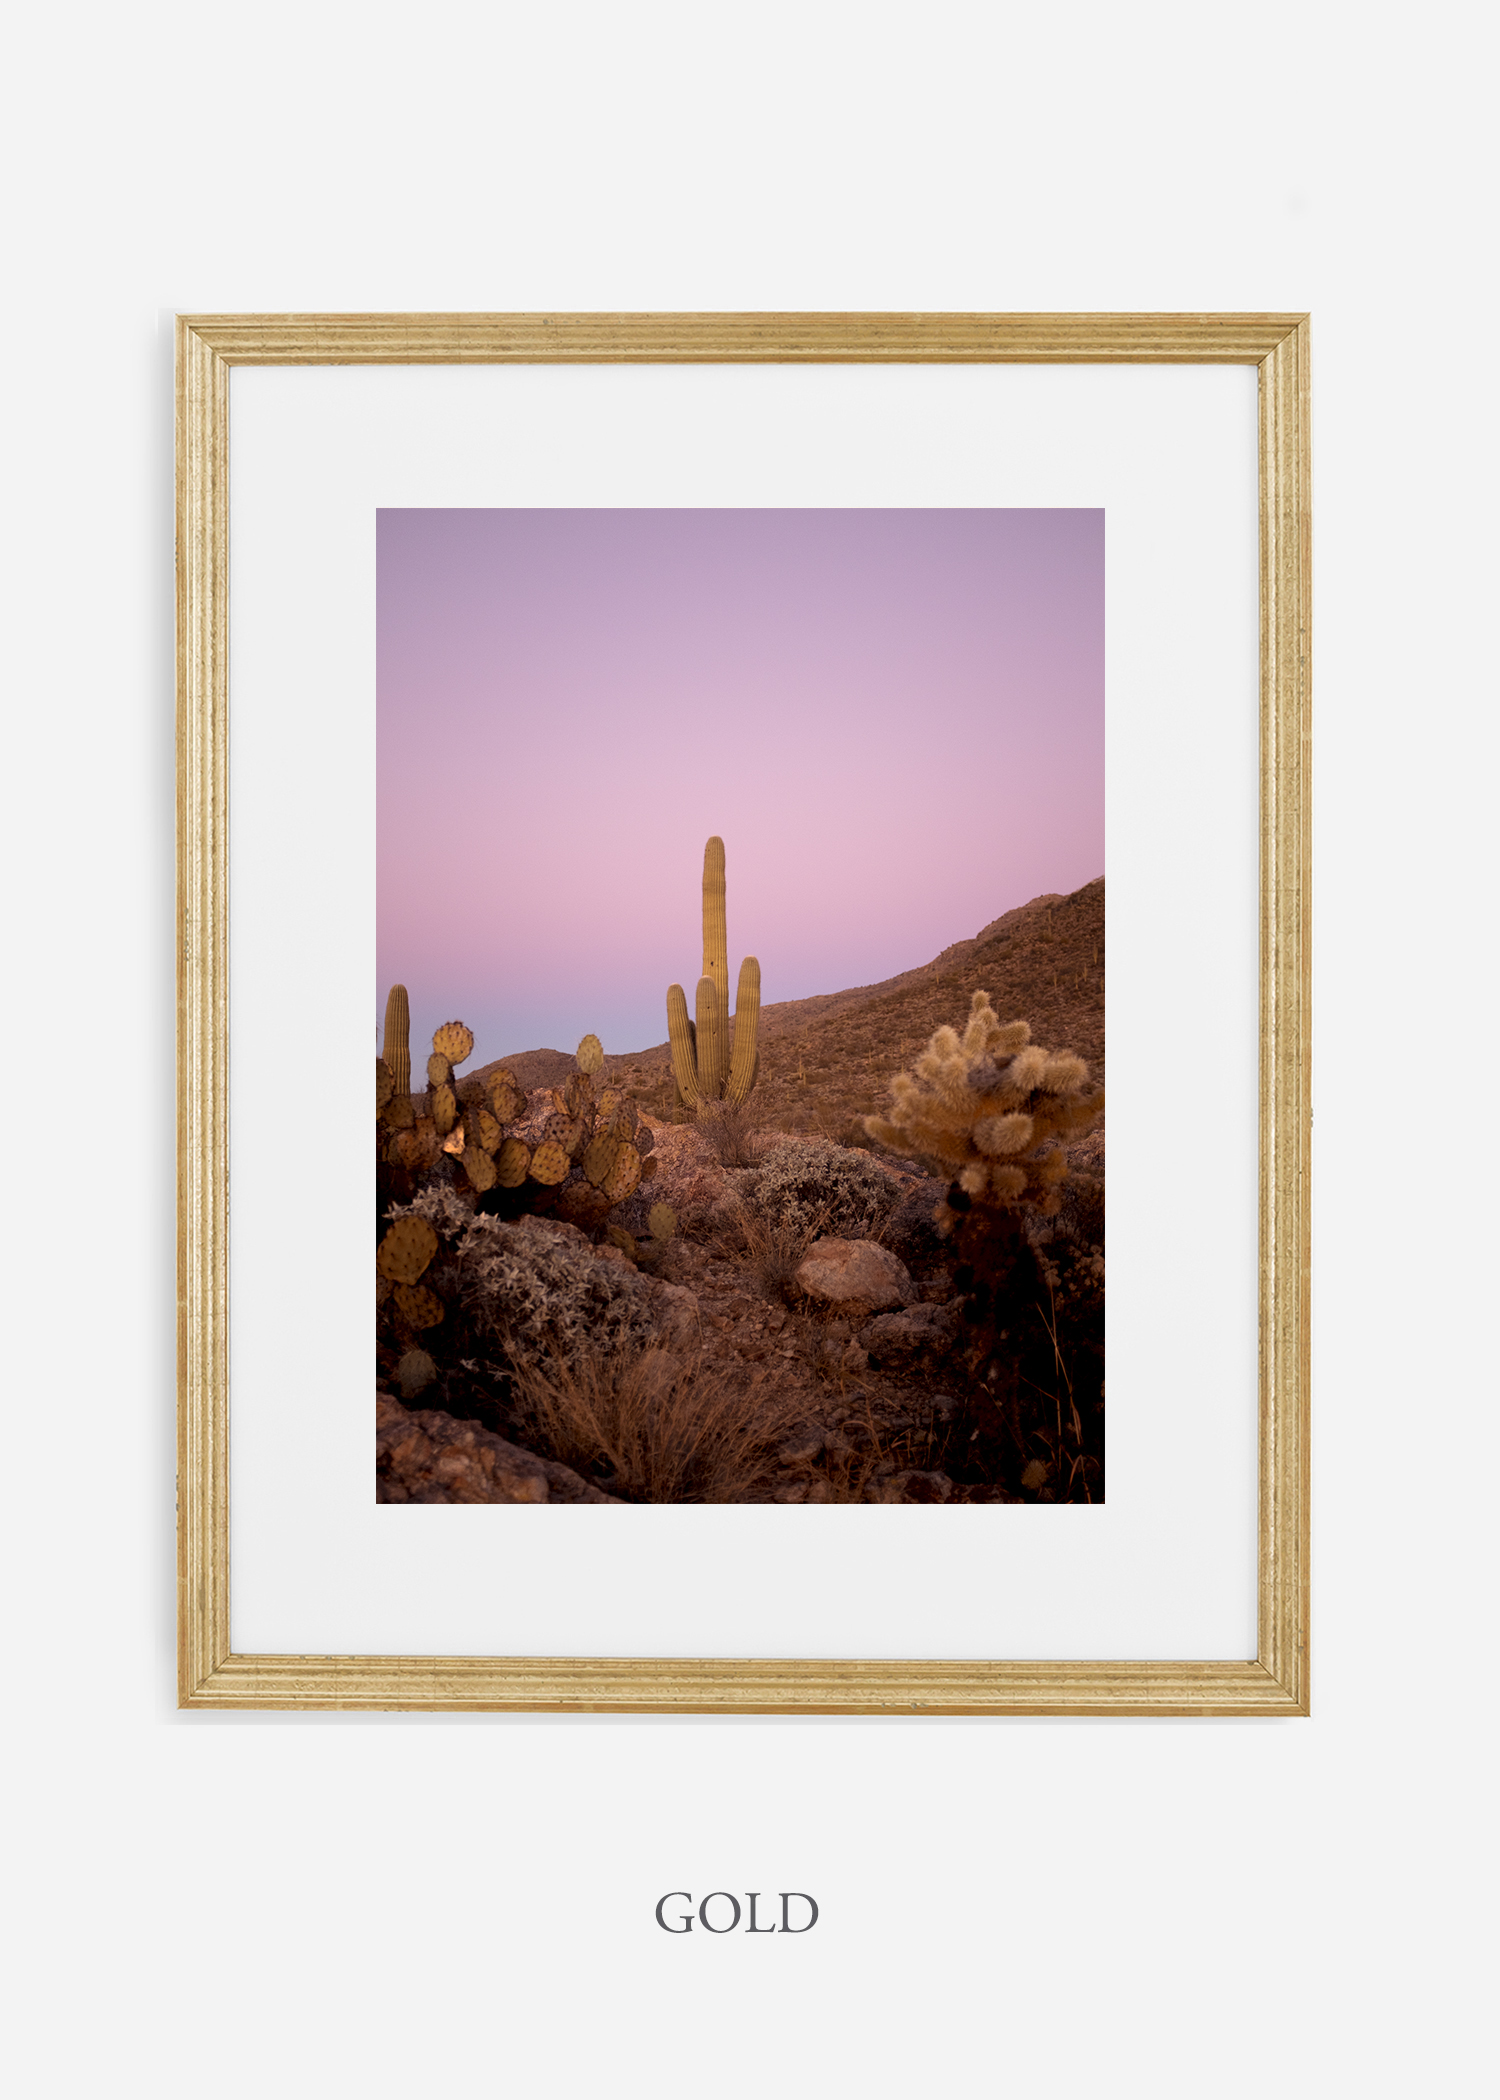 goldframe-saguaroNo.10-wildercalifornia-art-wallart-cactusprint-homedecor-prints-arizona-botanical-artwork-interiordesign.jpg